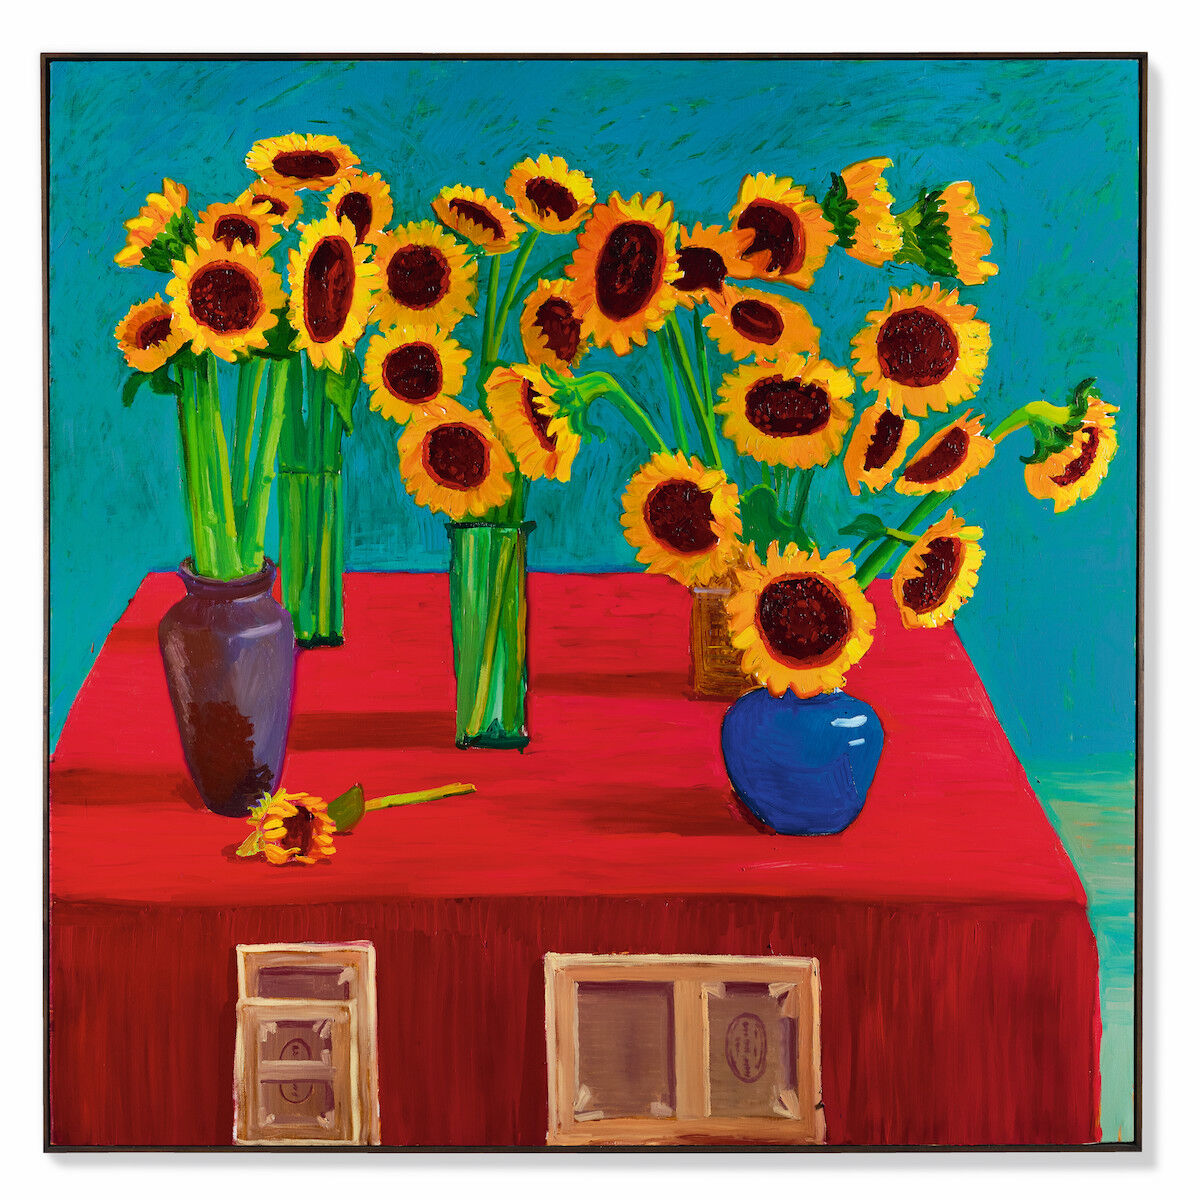 David Hockney, 30 Sunflowers, 1996. Est. in excess of HK$80 million (US$10.3 million). Courtesy Sotheby's.